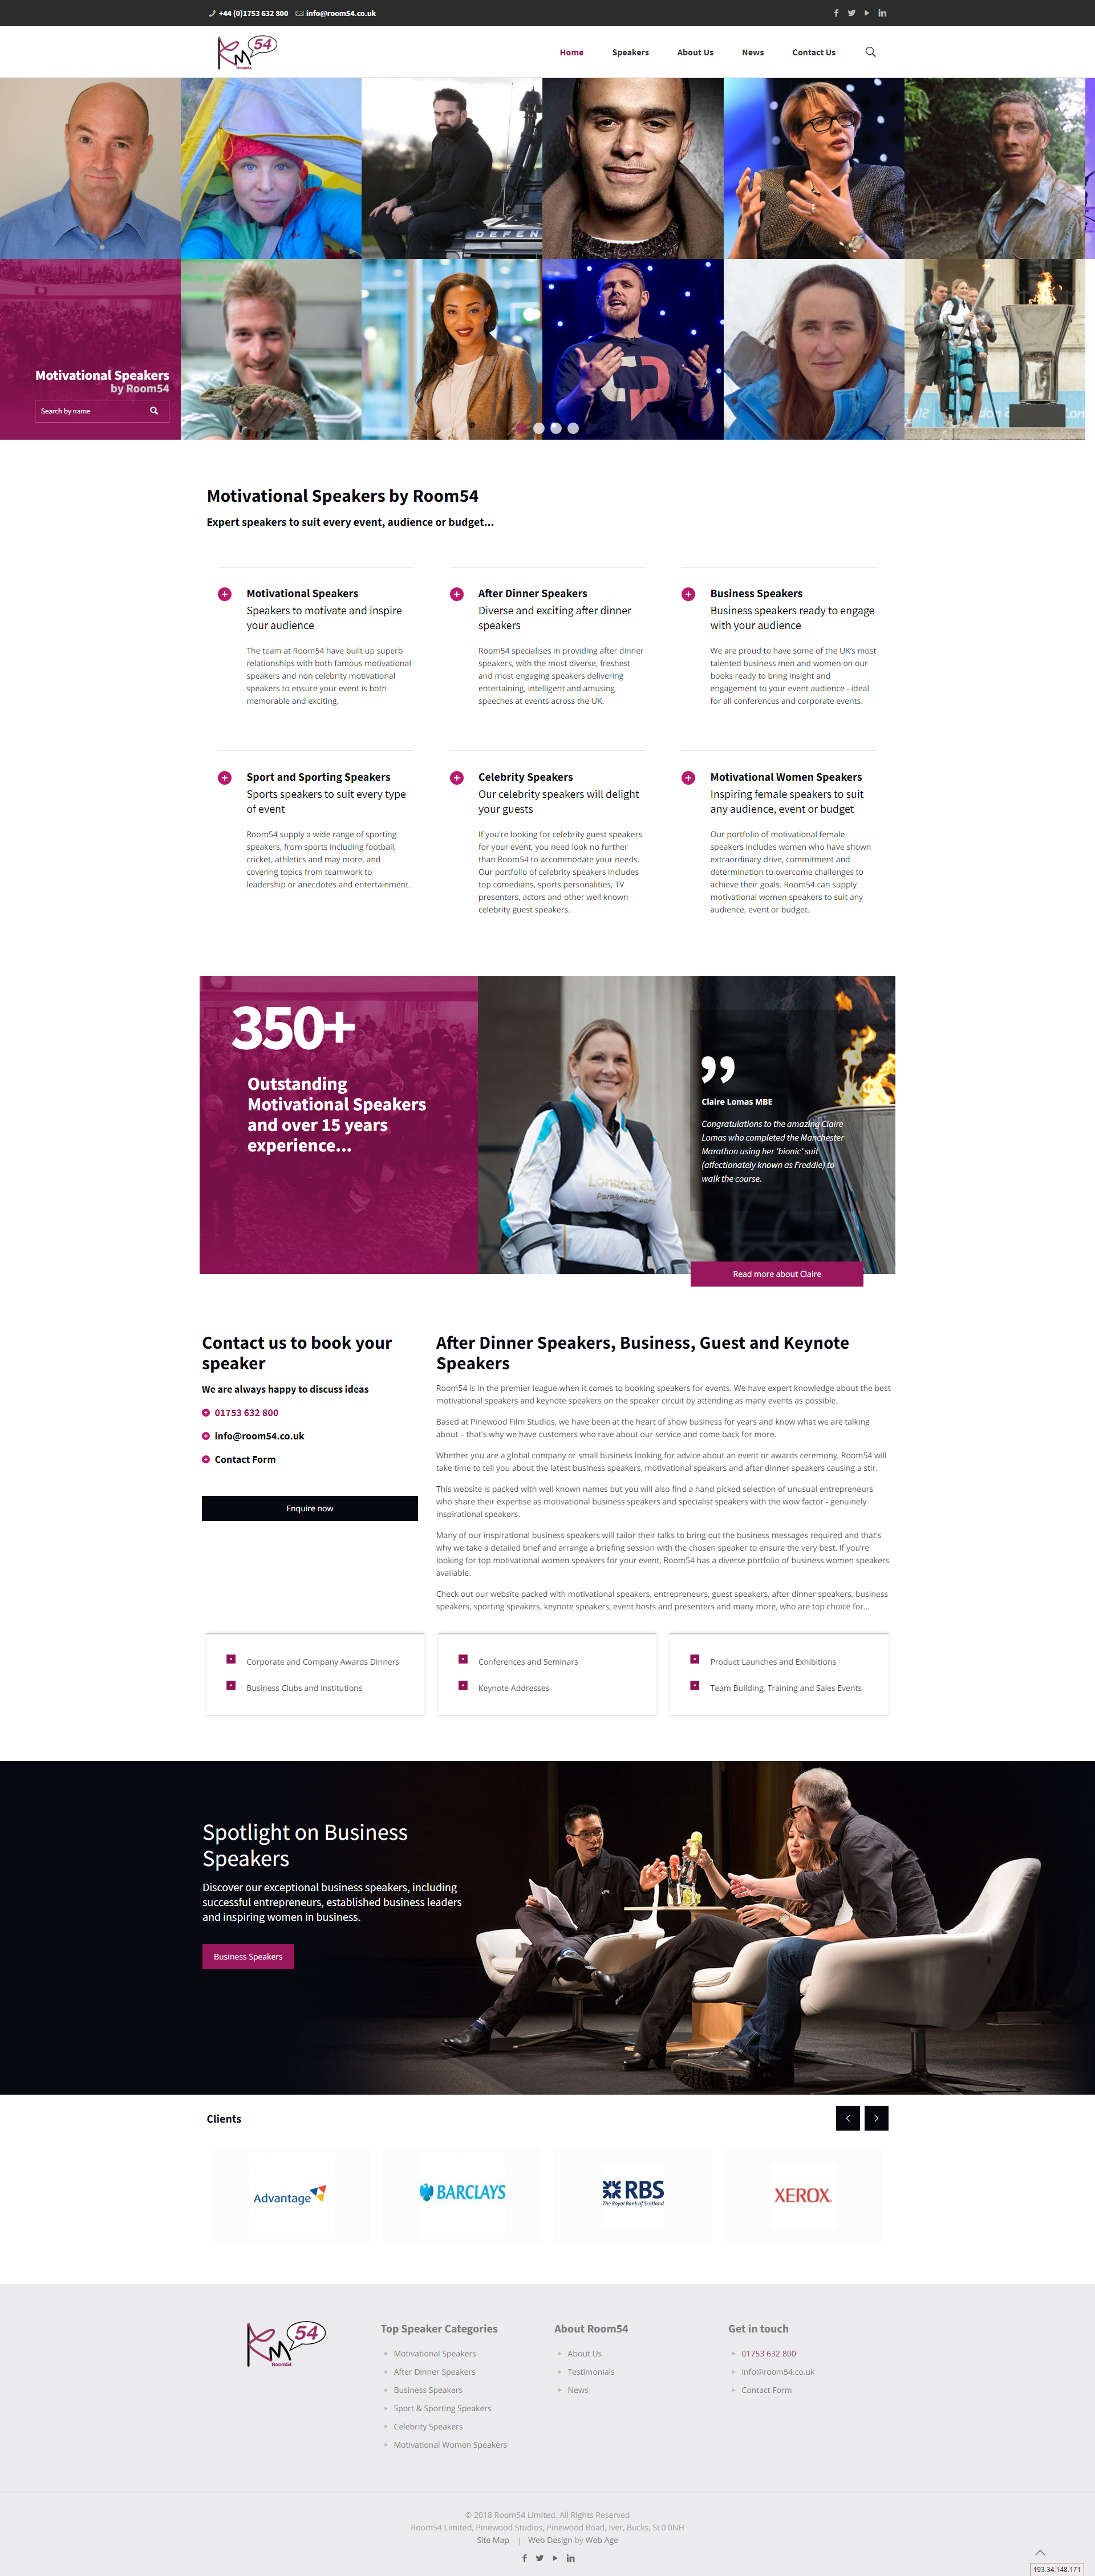 Web design and development for motivational-speakers.co.uk